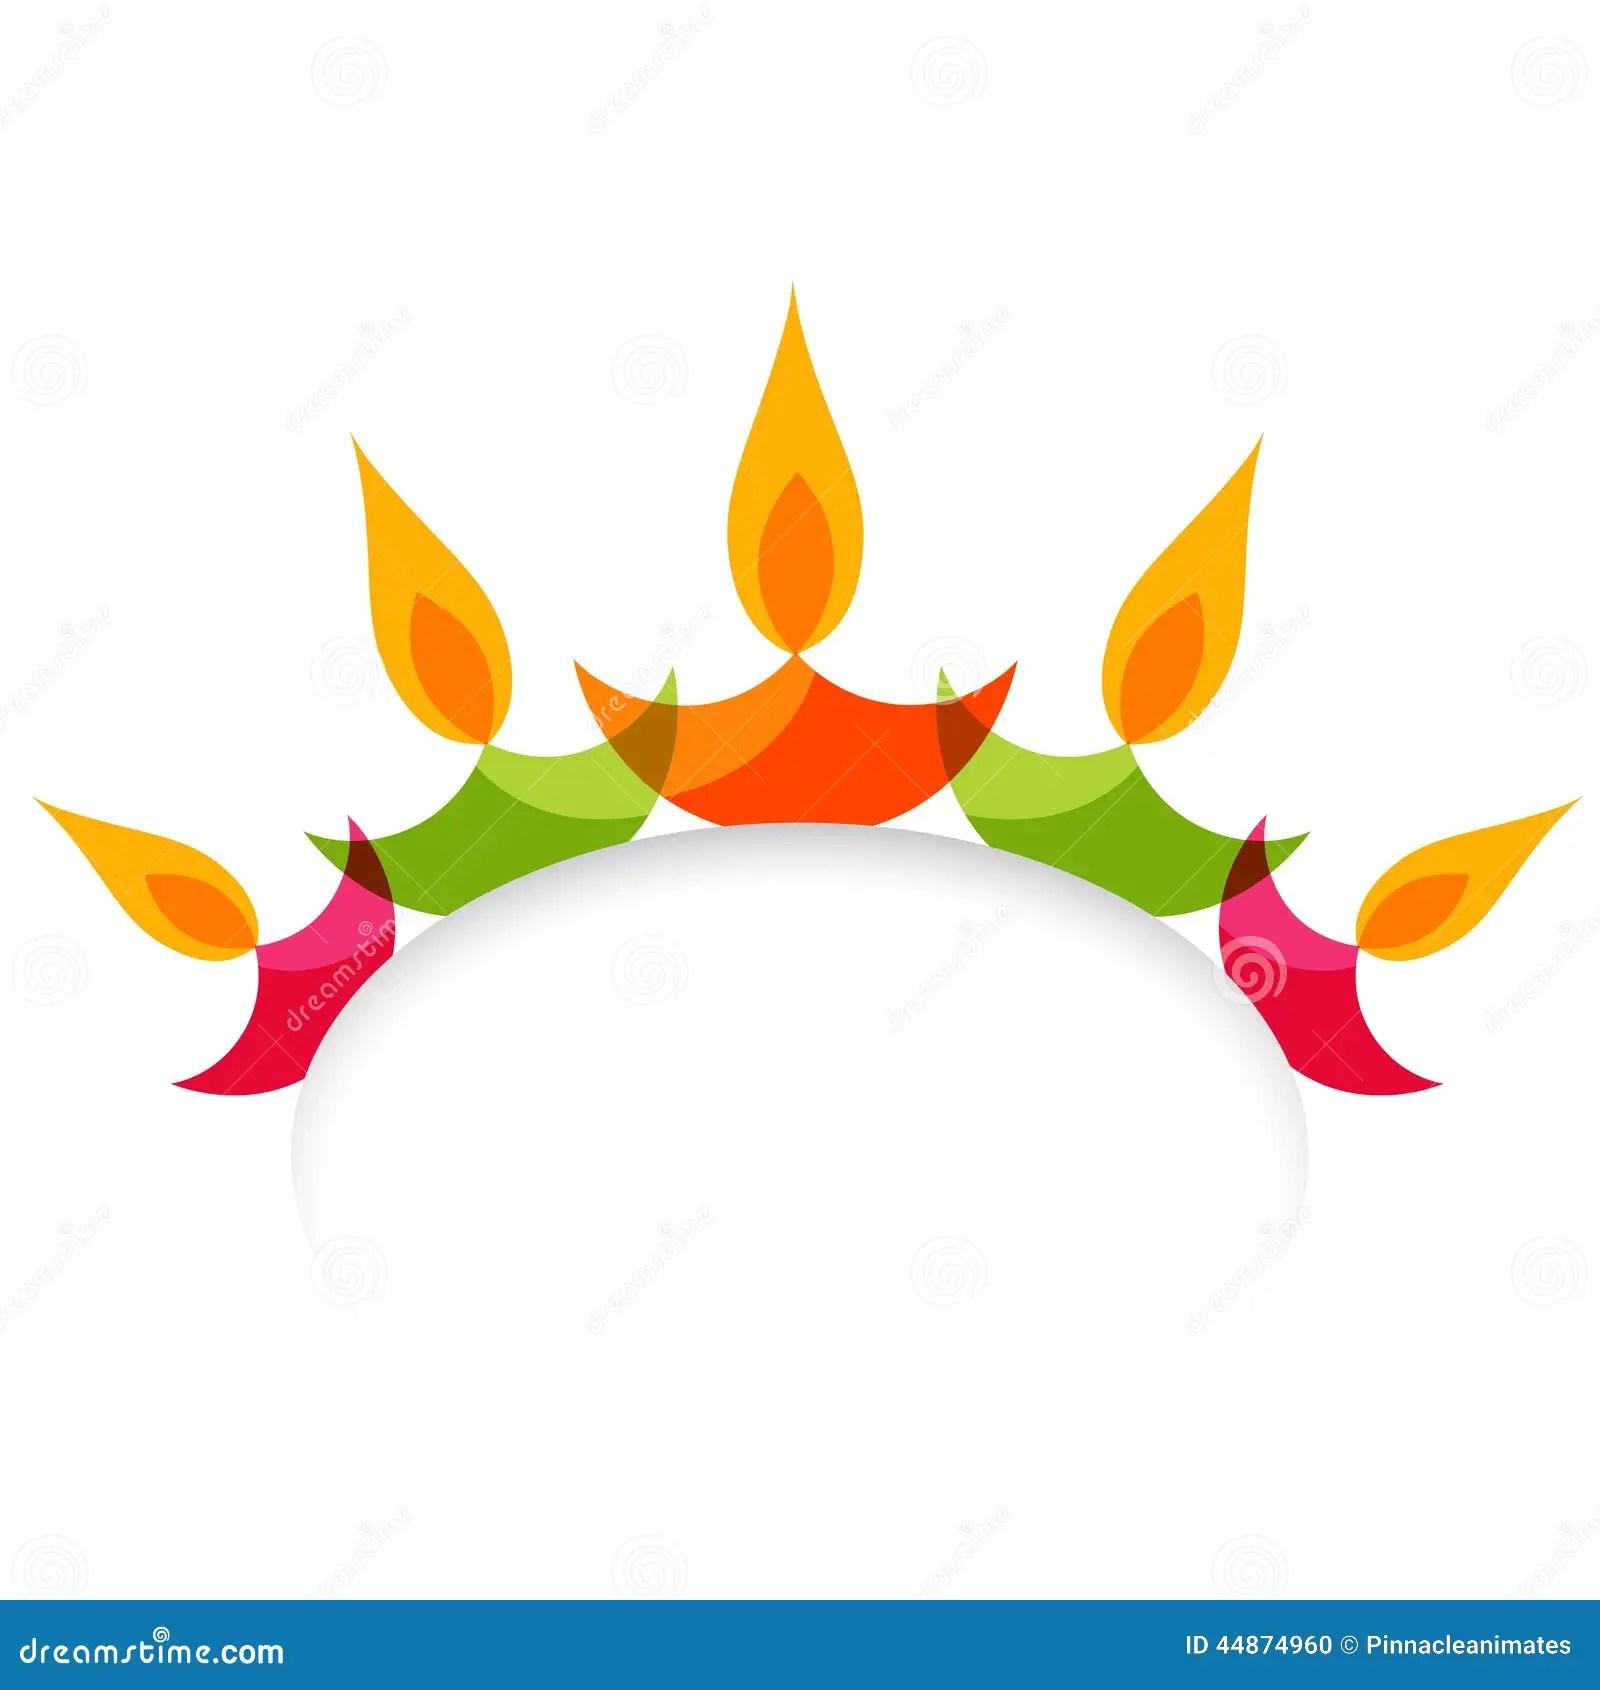 Animated Diwali Diya Wallpapers Stylish Colorful Diwali Diya Isolated On White Background